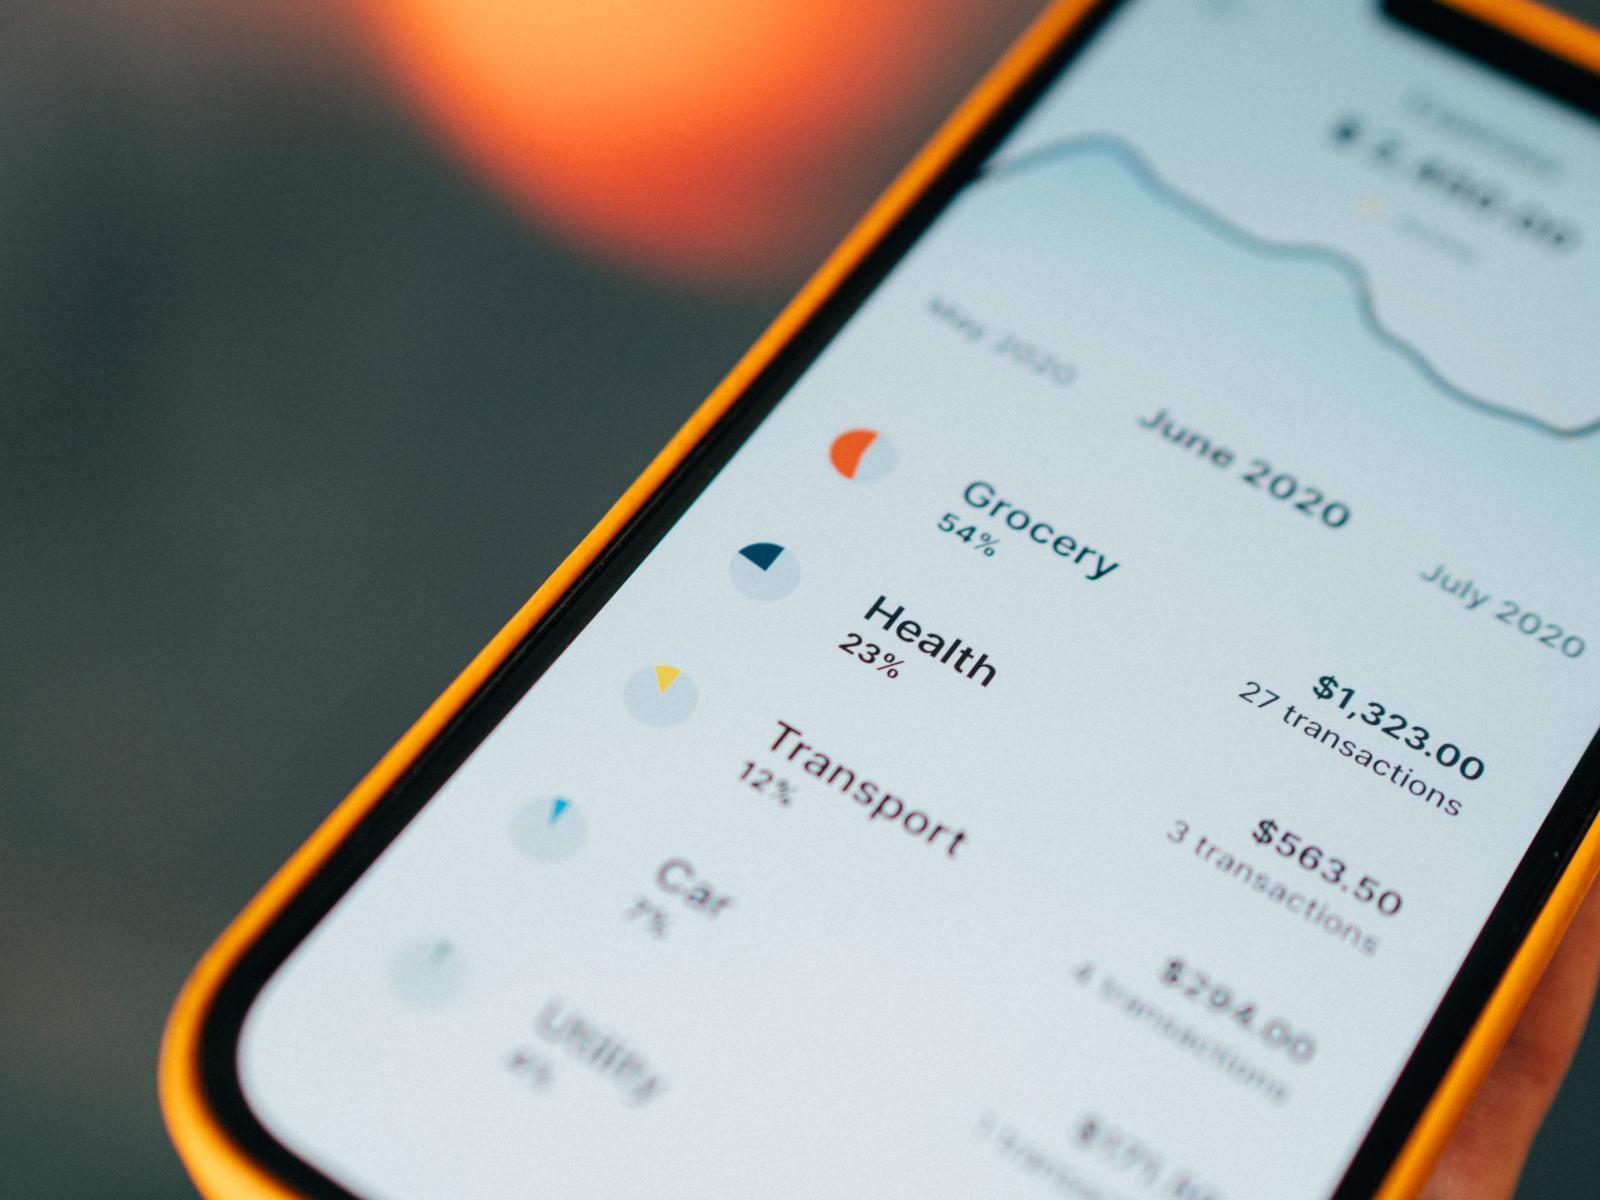 Mobile banking prototype